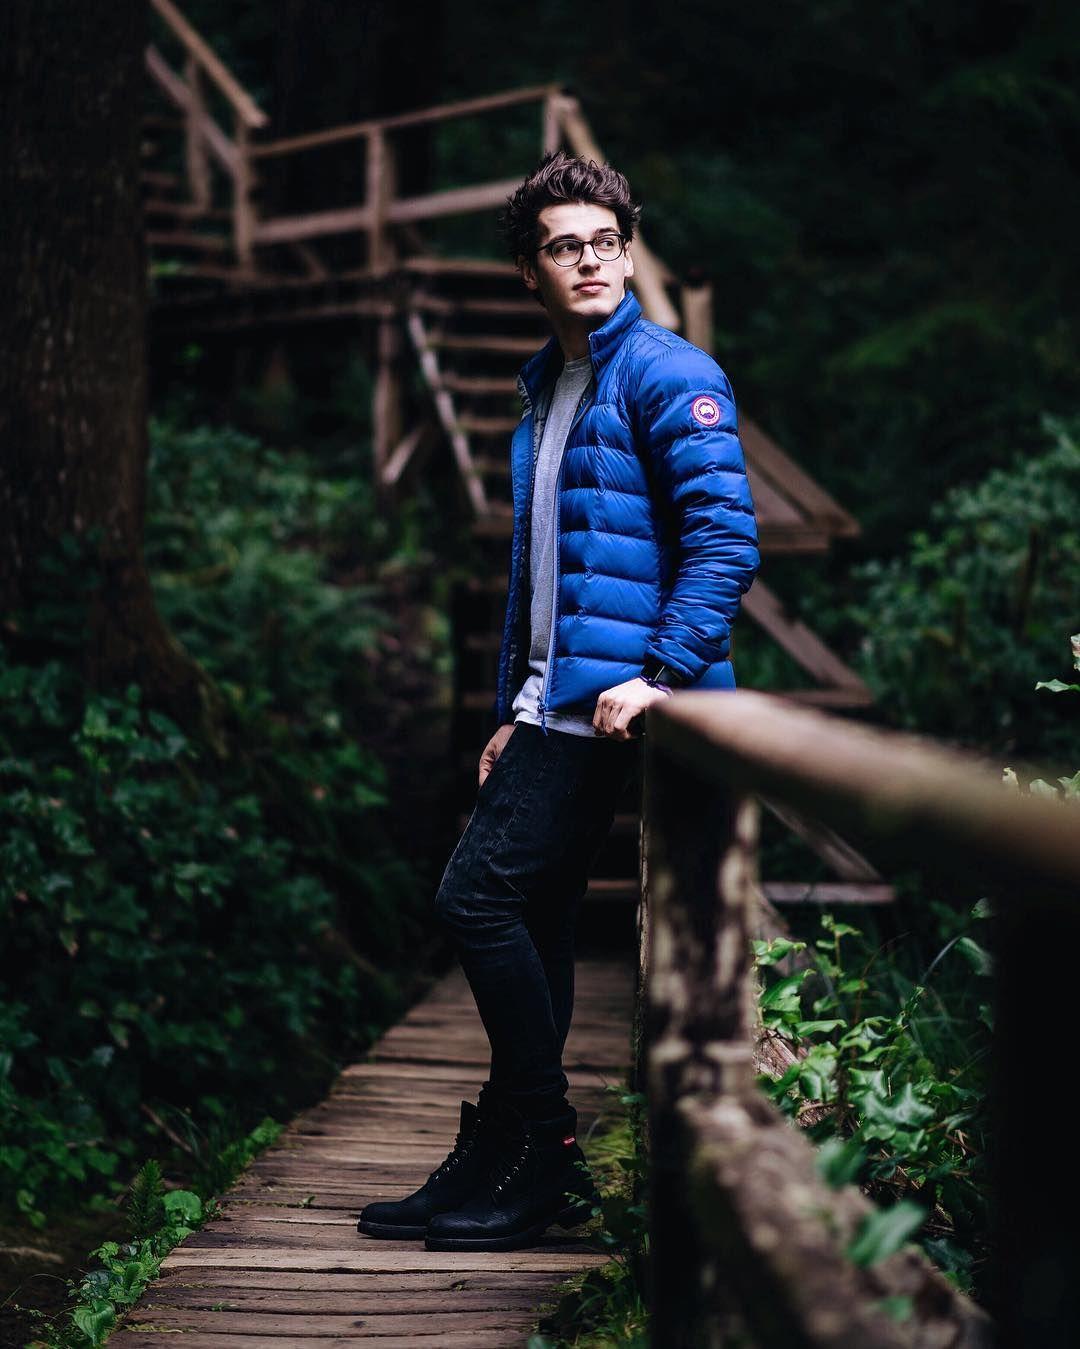 Instagram Photography Poses For Men Portrait Photography Men Poses For Men